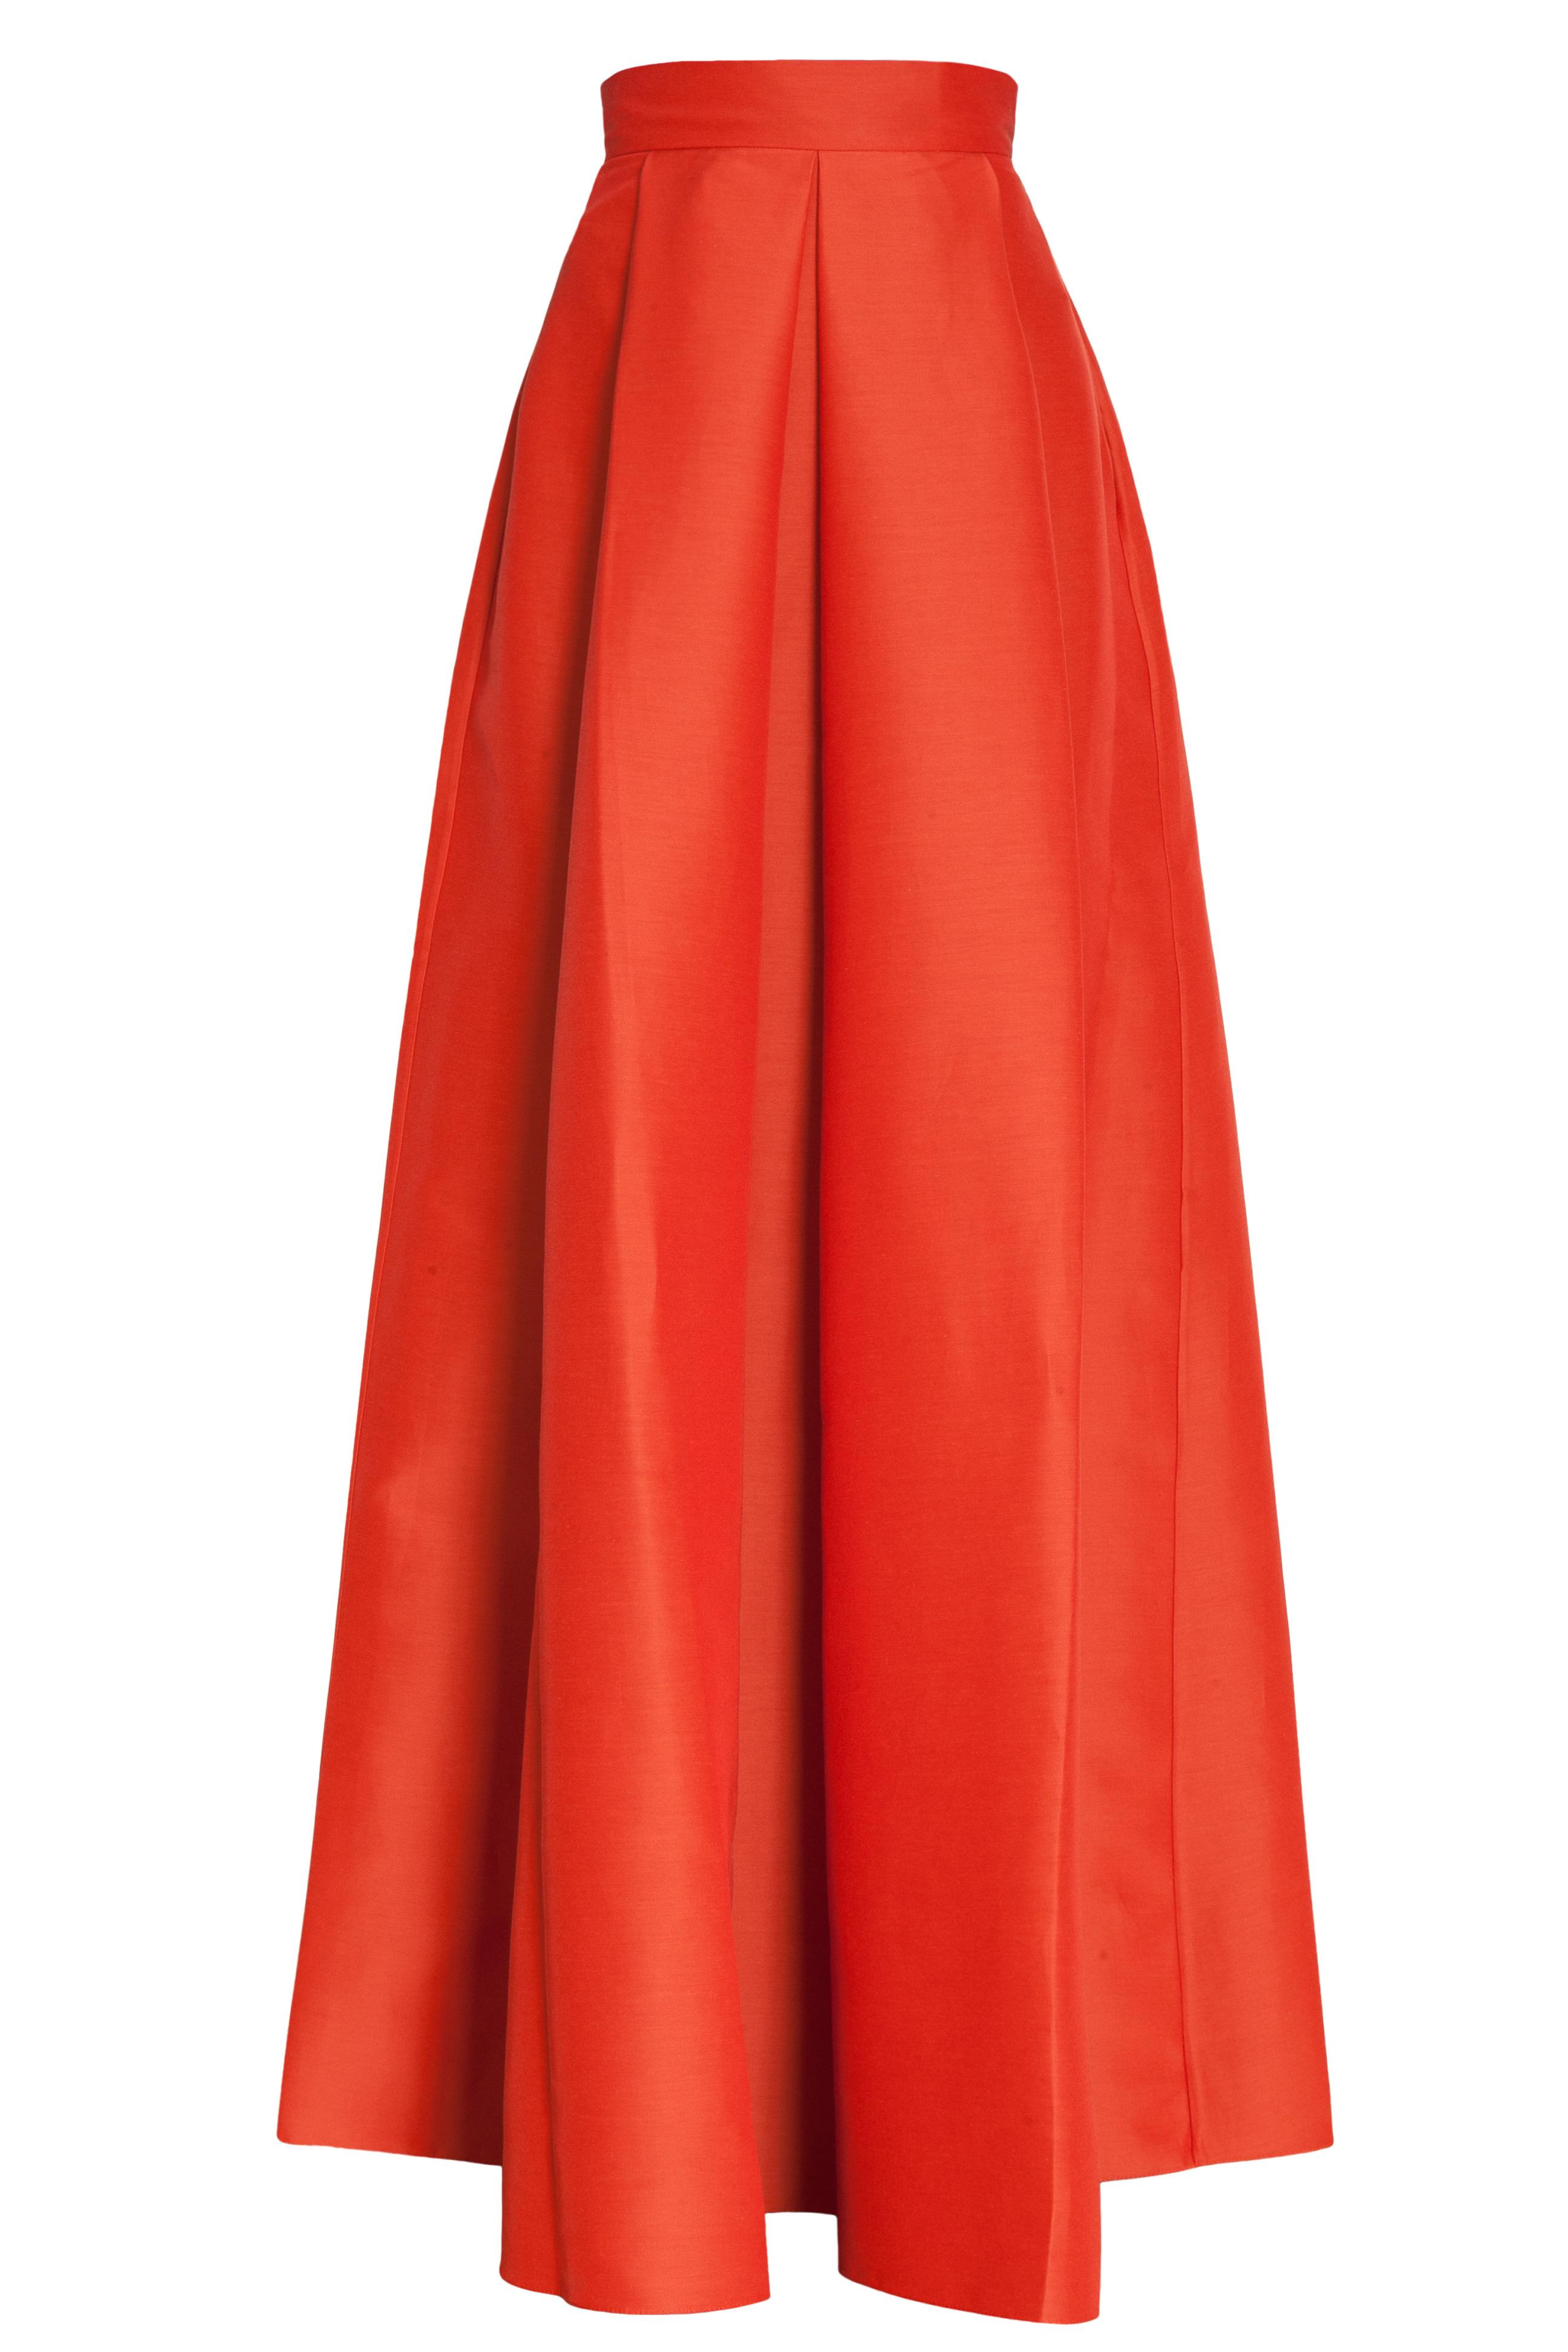 Flared Maxi Skirt - Dress Ala